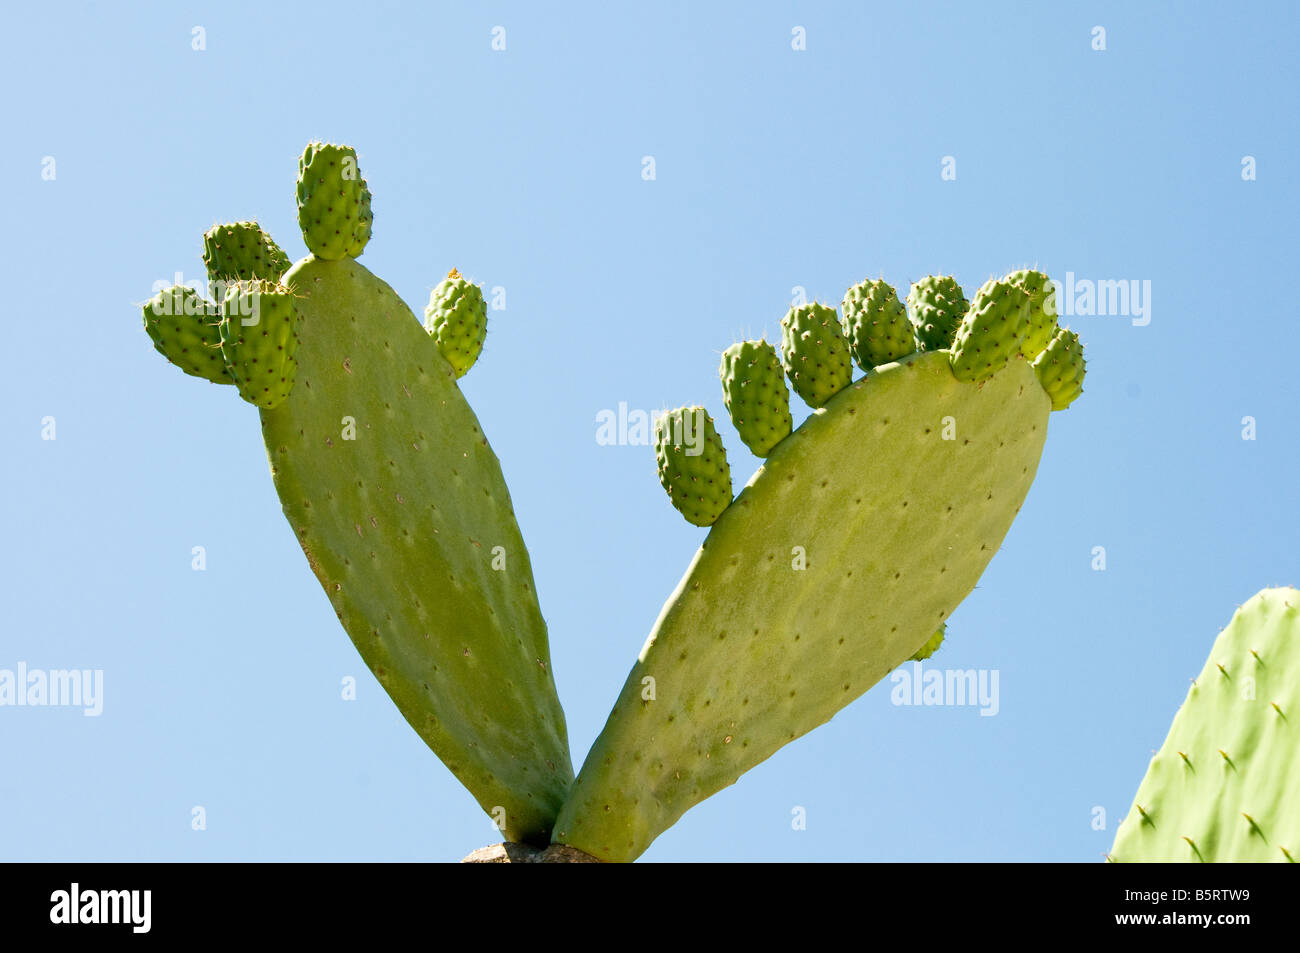 Prickly Pear Cactus Stockfoto